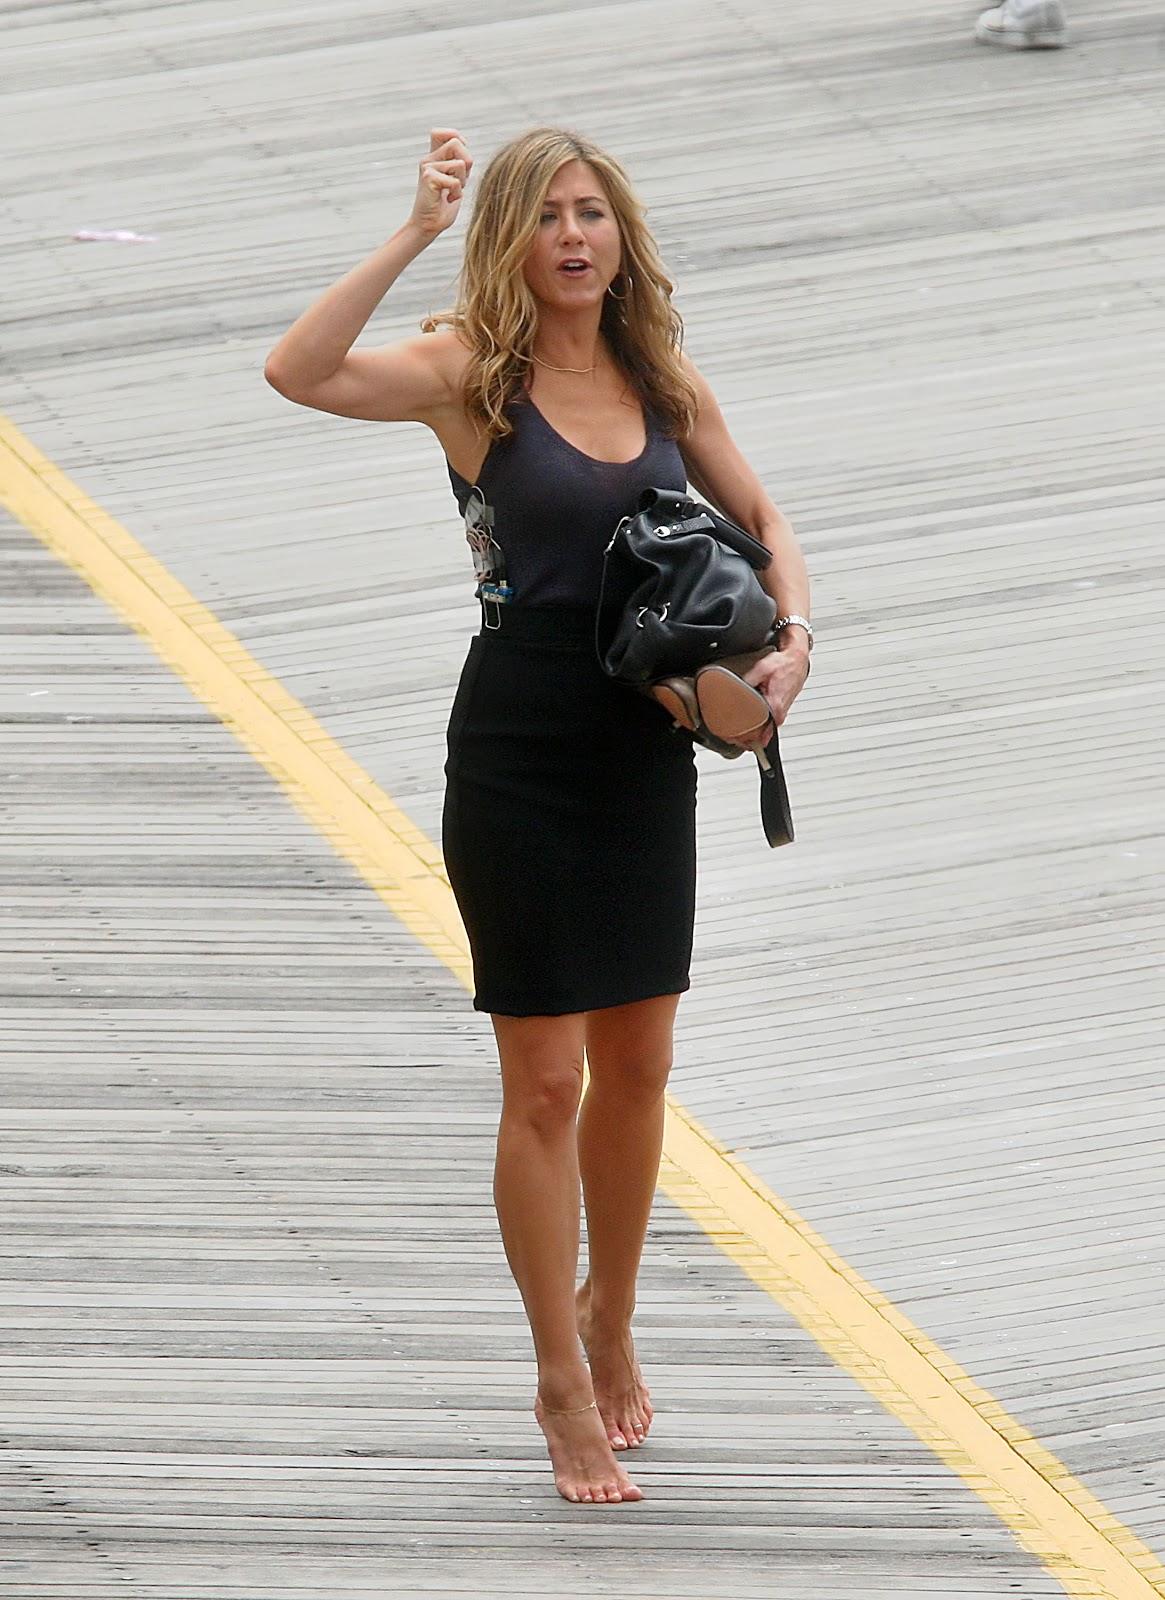 Barefoot celebrities jennifer aniston walking with no shoes - Jennifer aniston barefoot ...